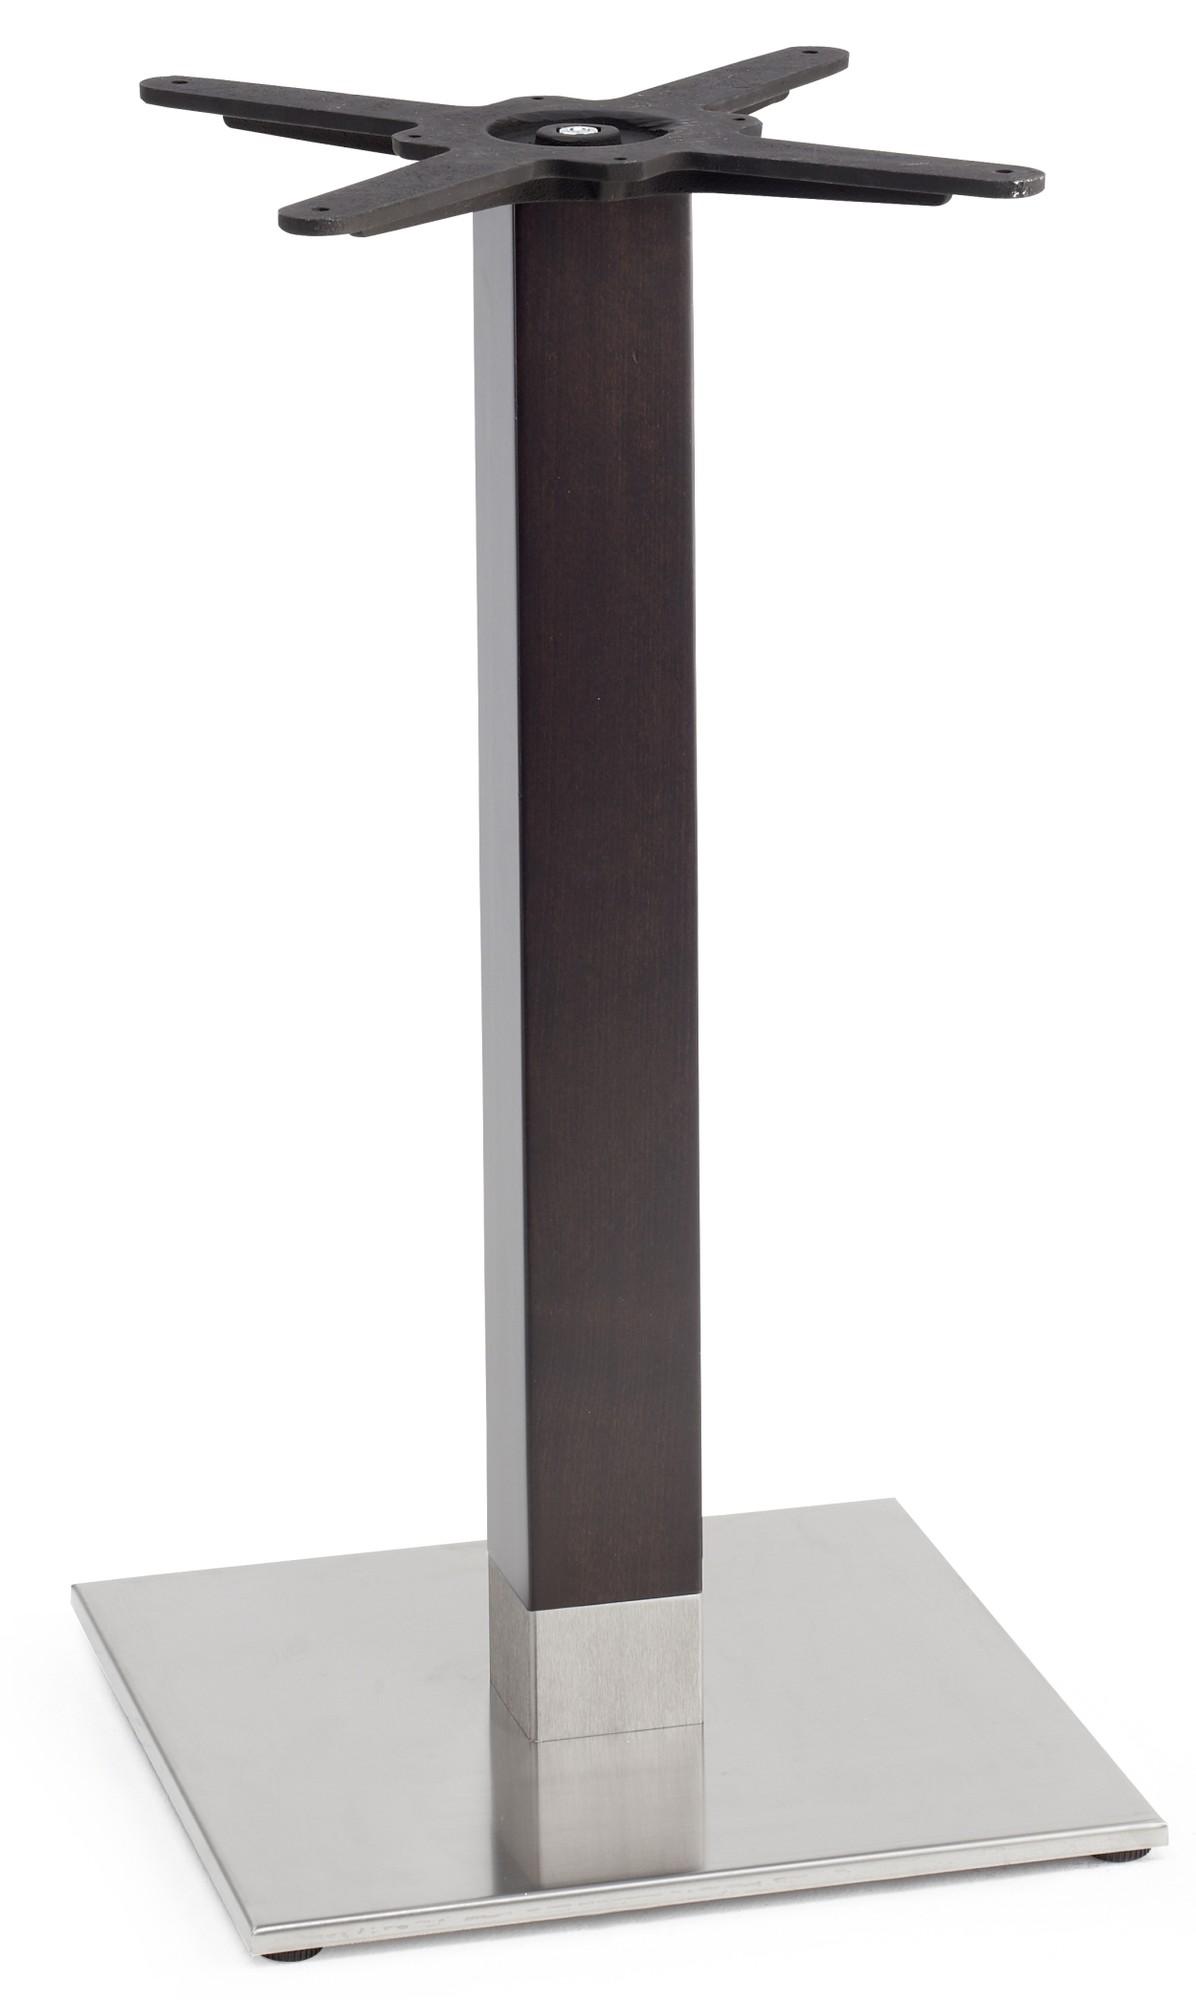 SCAB Design Tafelonderstel Tiffany Natural - Hoogte 73 Cm - Vierkante Voetplaat - Wengé- Gepolijst RVS